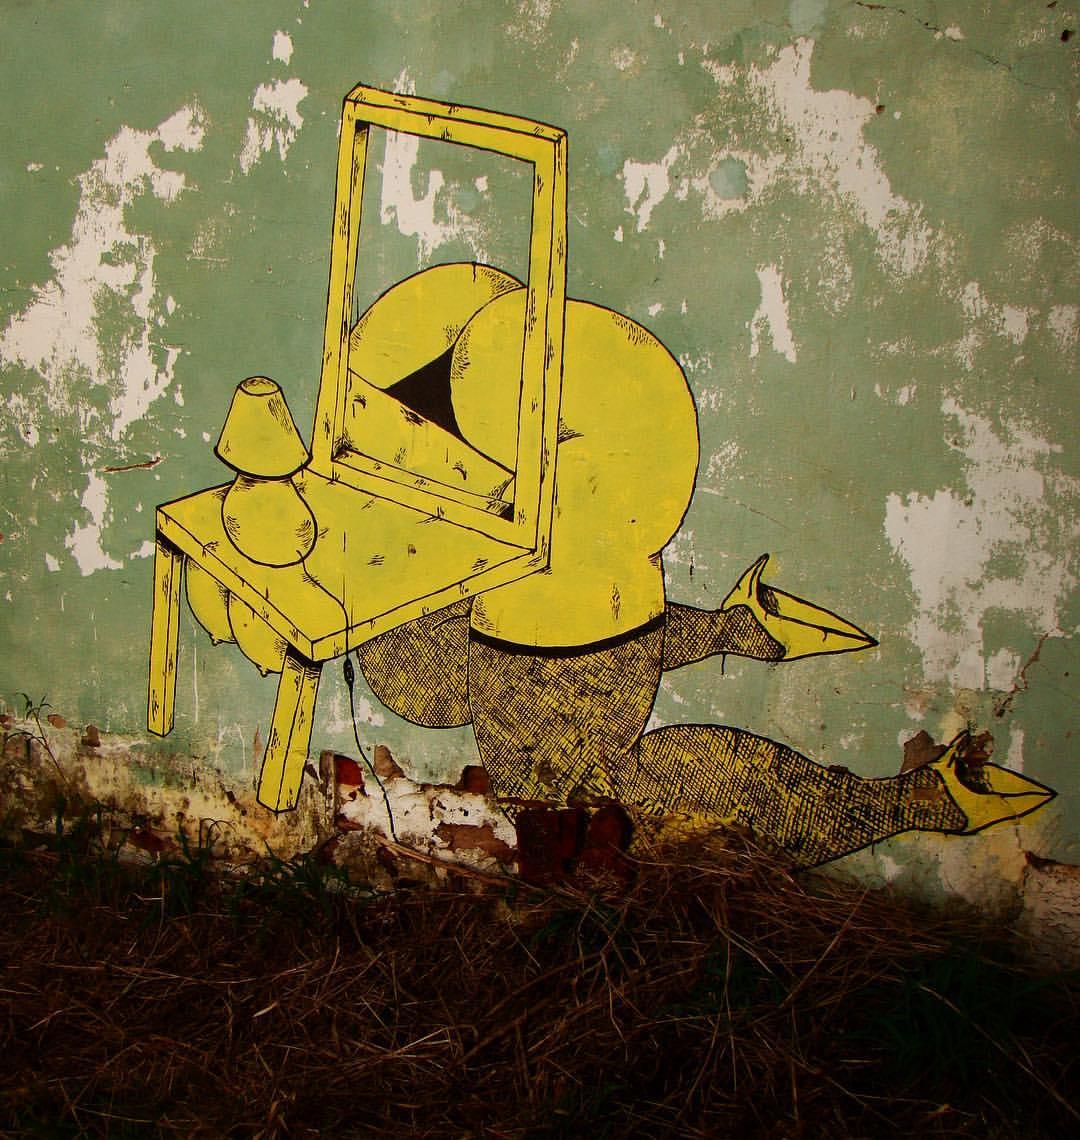 Salomão-montenegro-graffiti